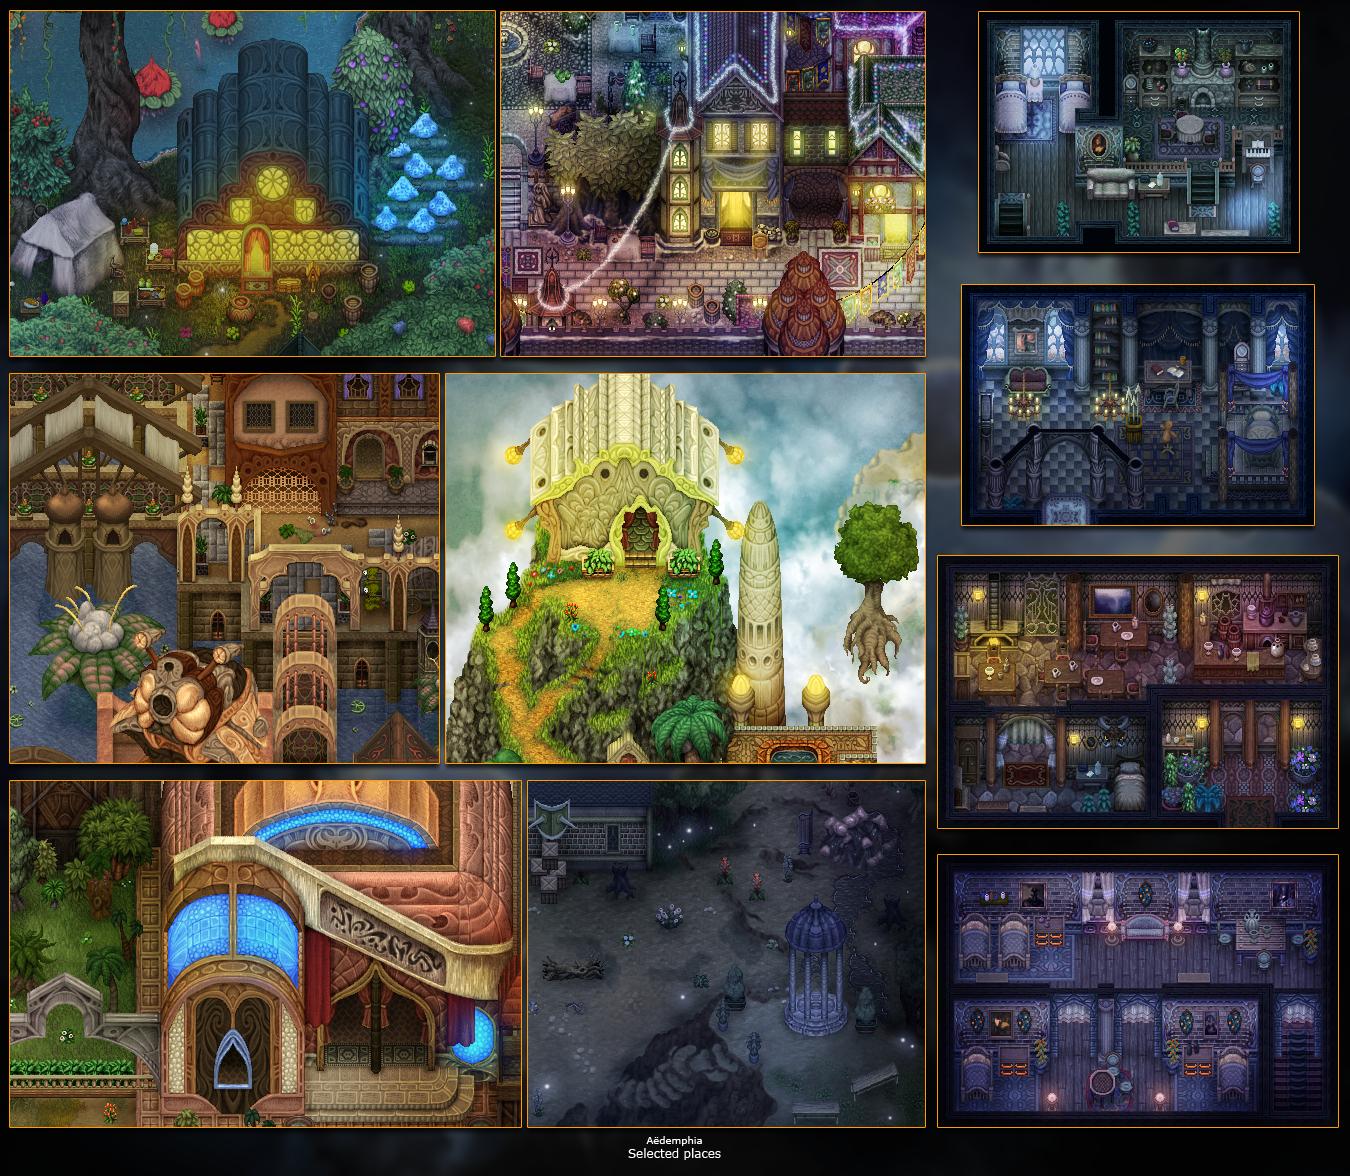 Best Looking RPG Maker Game | RPG Maker Forums